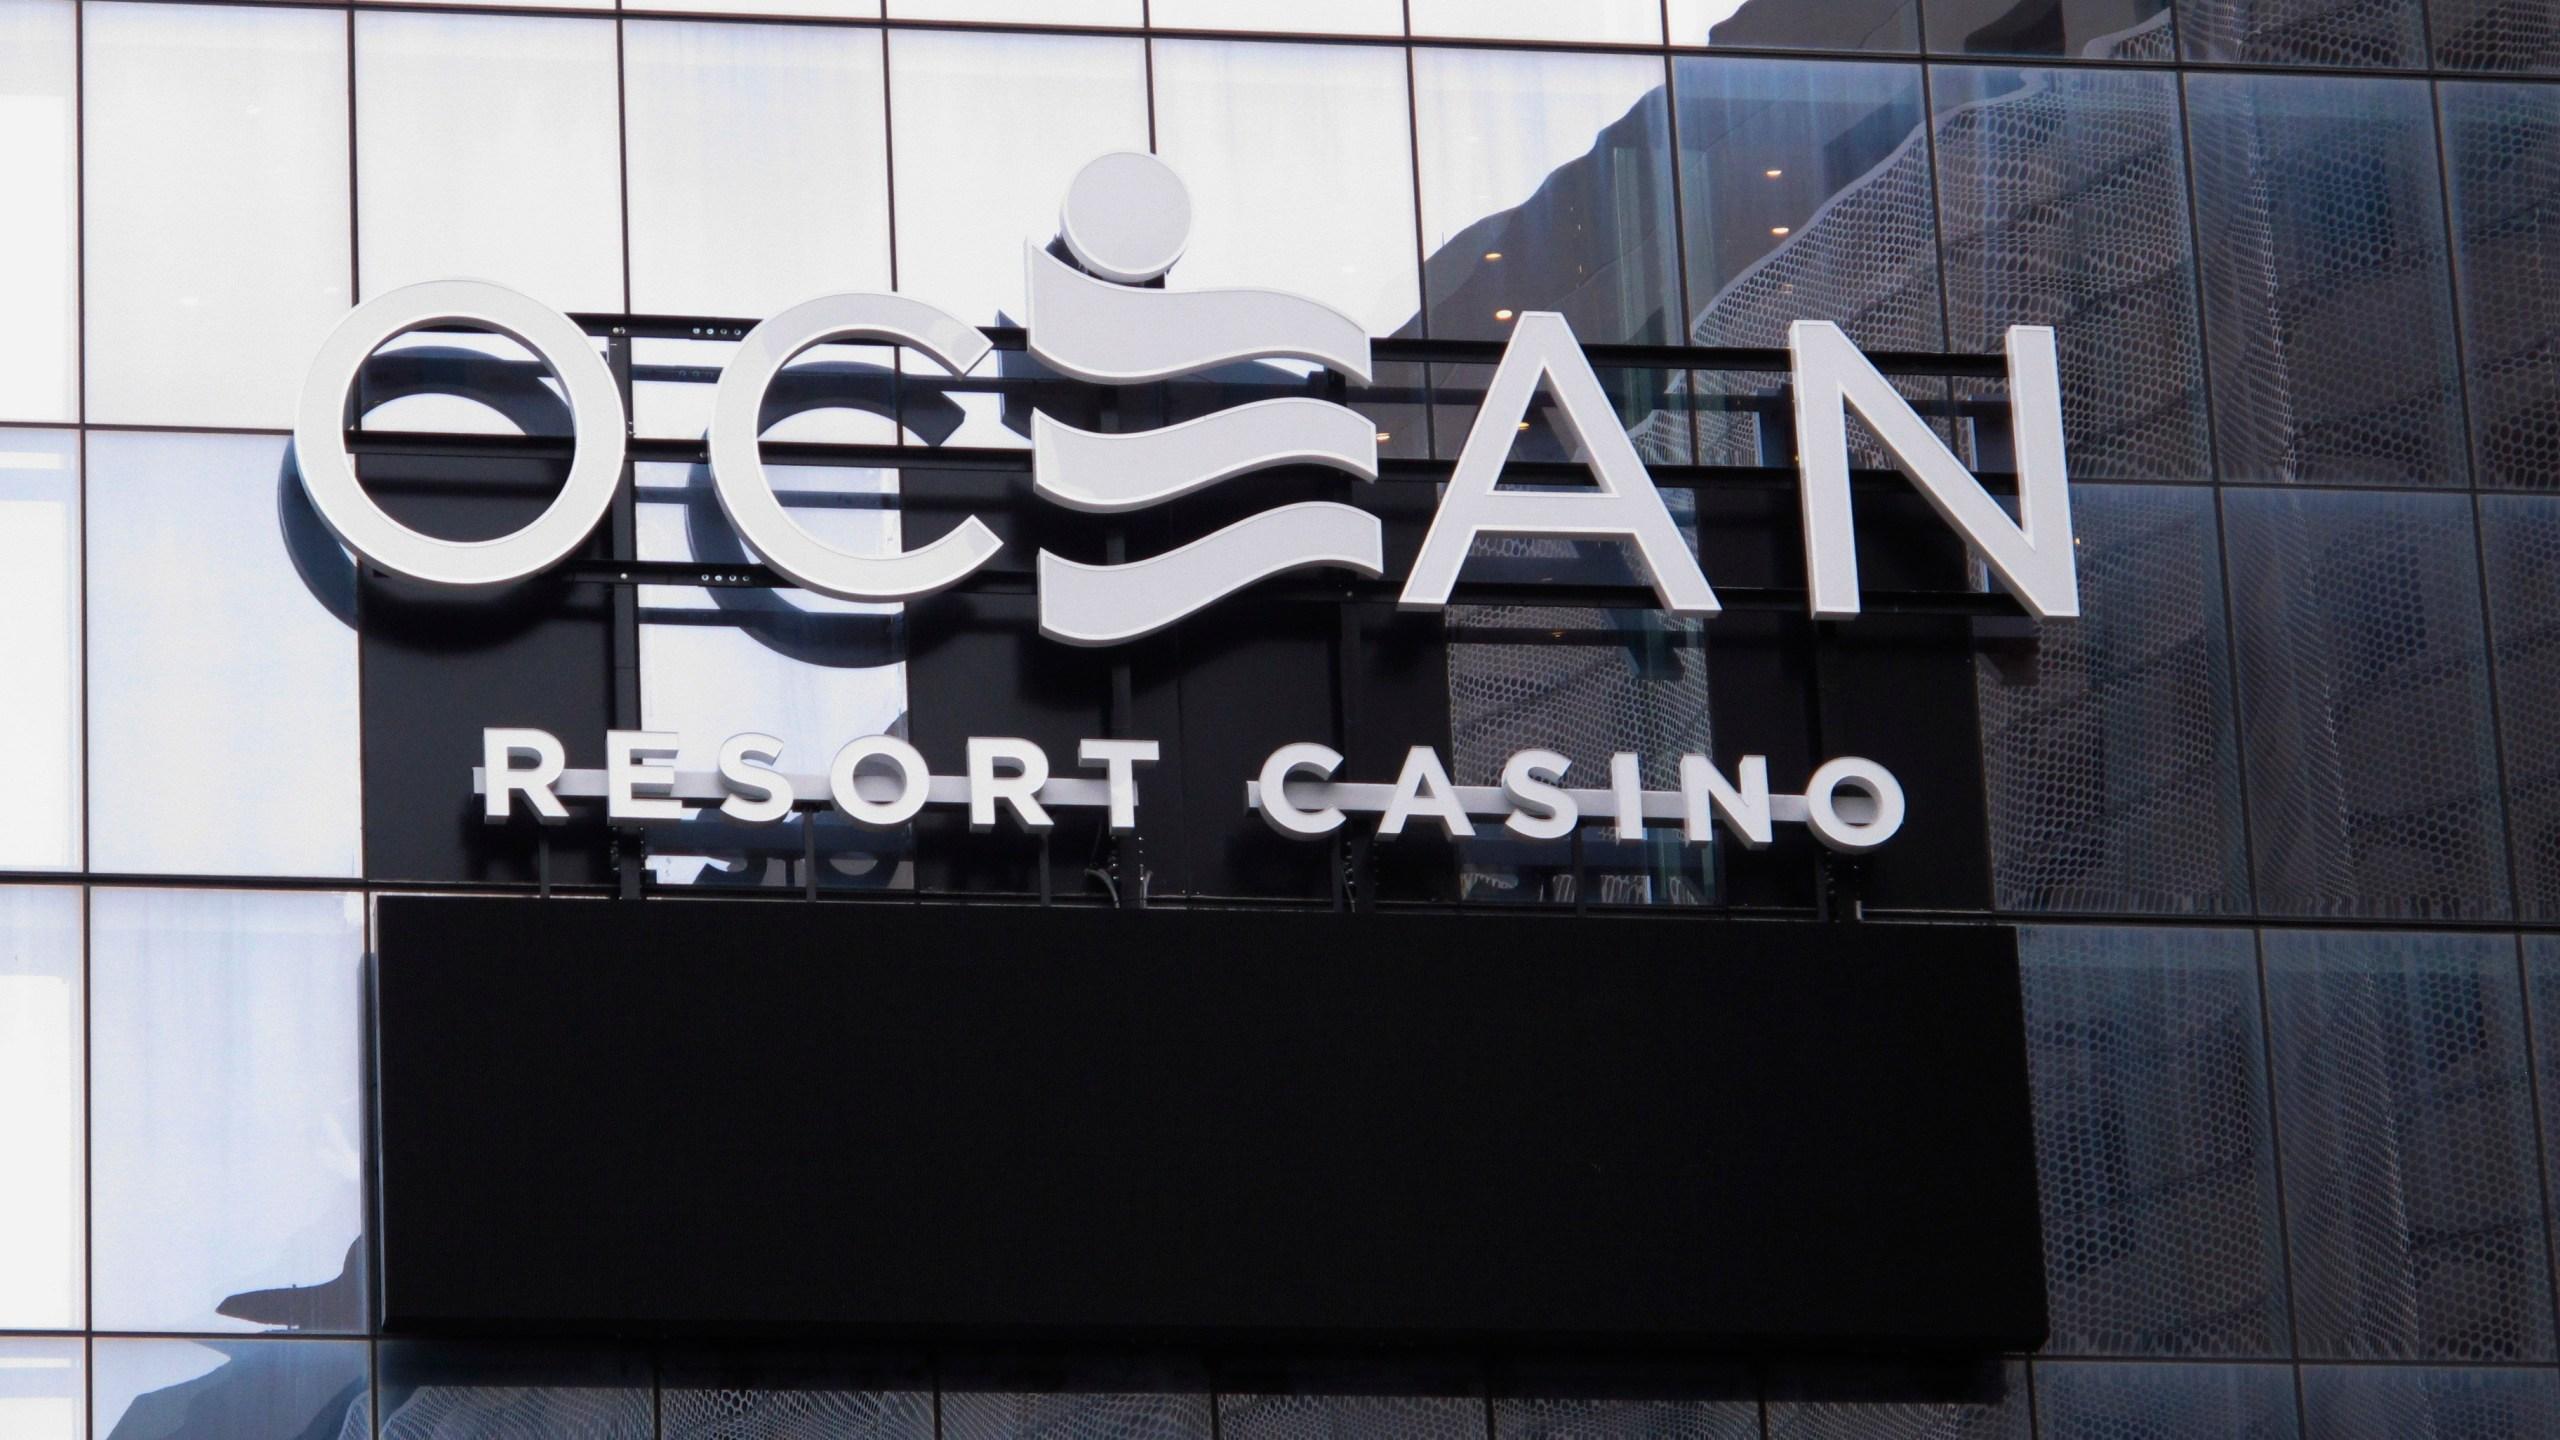 Atlantic_City_Casinos_Early_Opening_51282-159532.jpg14666154